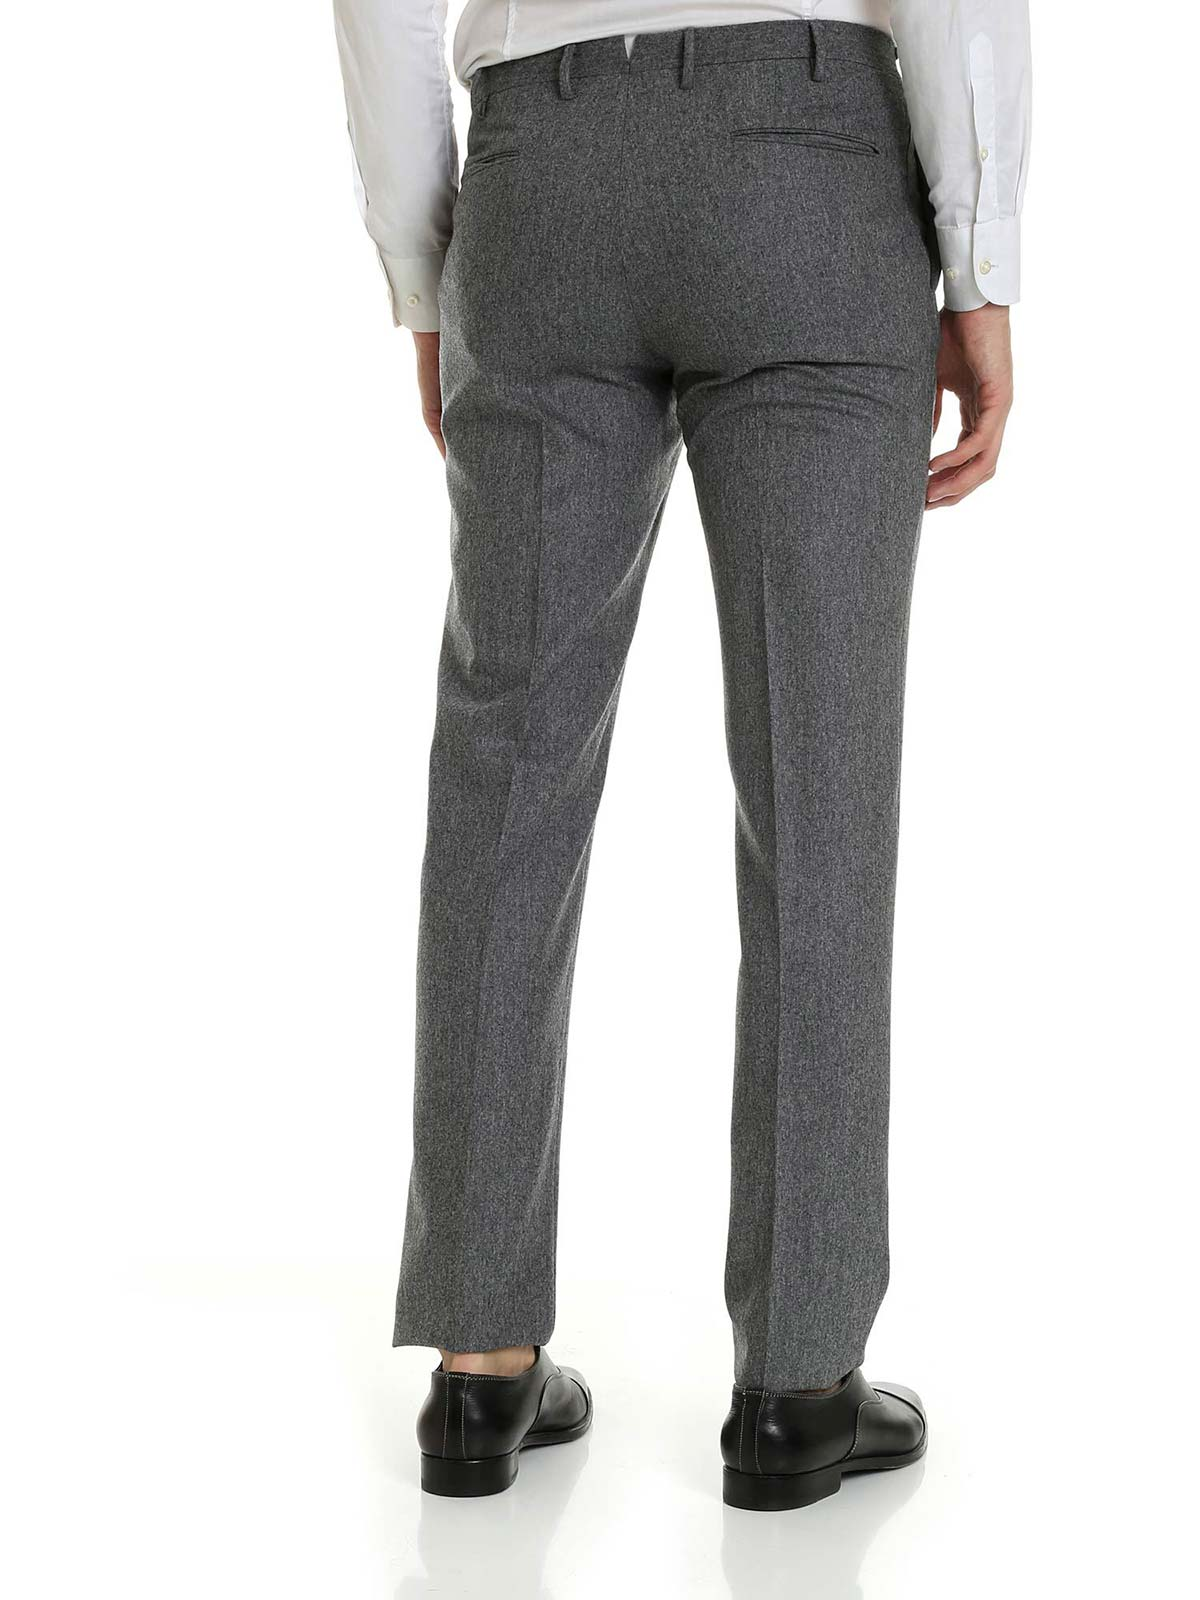 Immagine di INCOTEX | Pantaloni Uomo Slim Fit in Lana